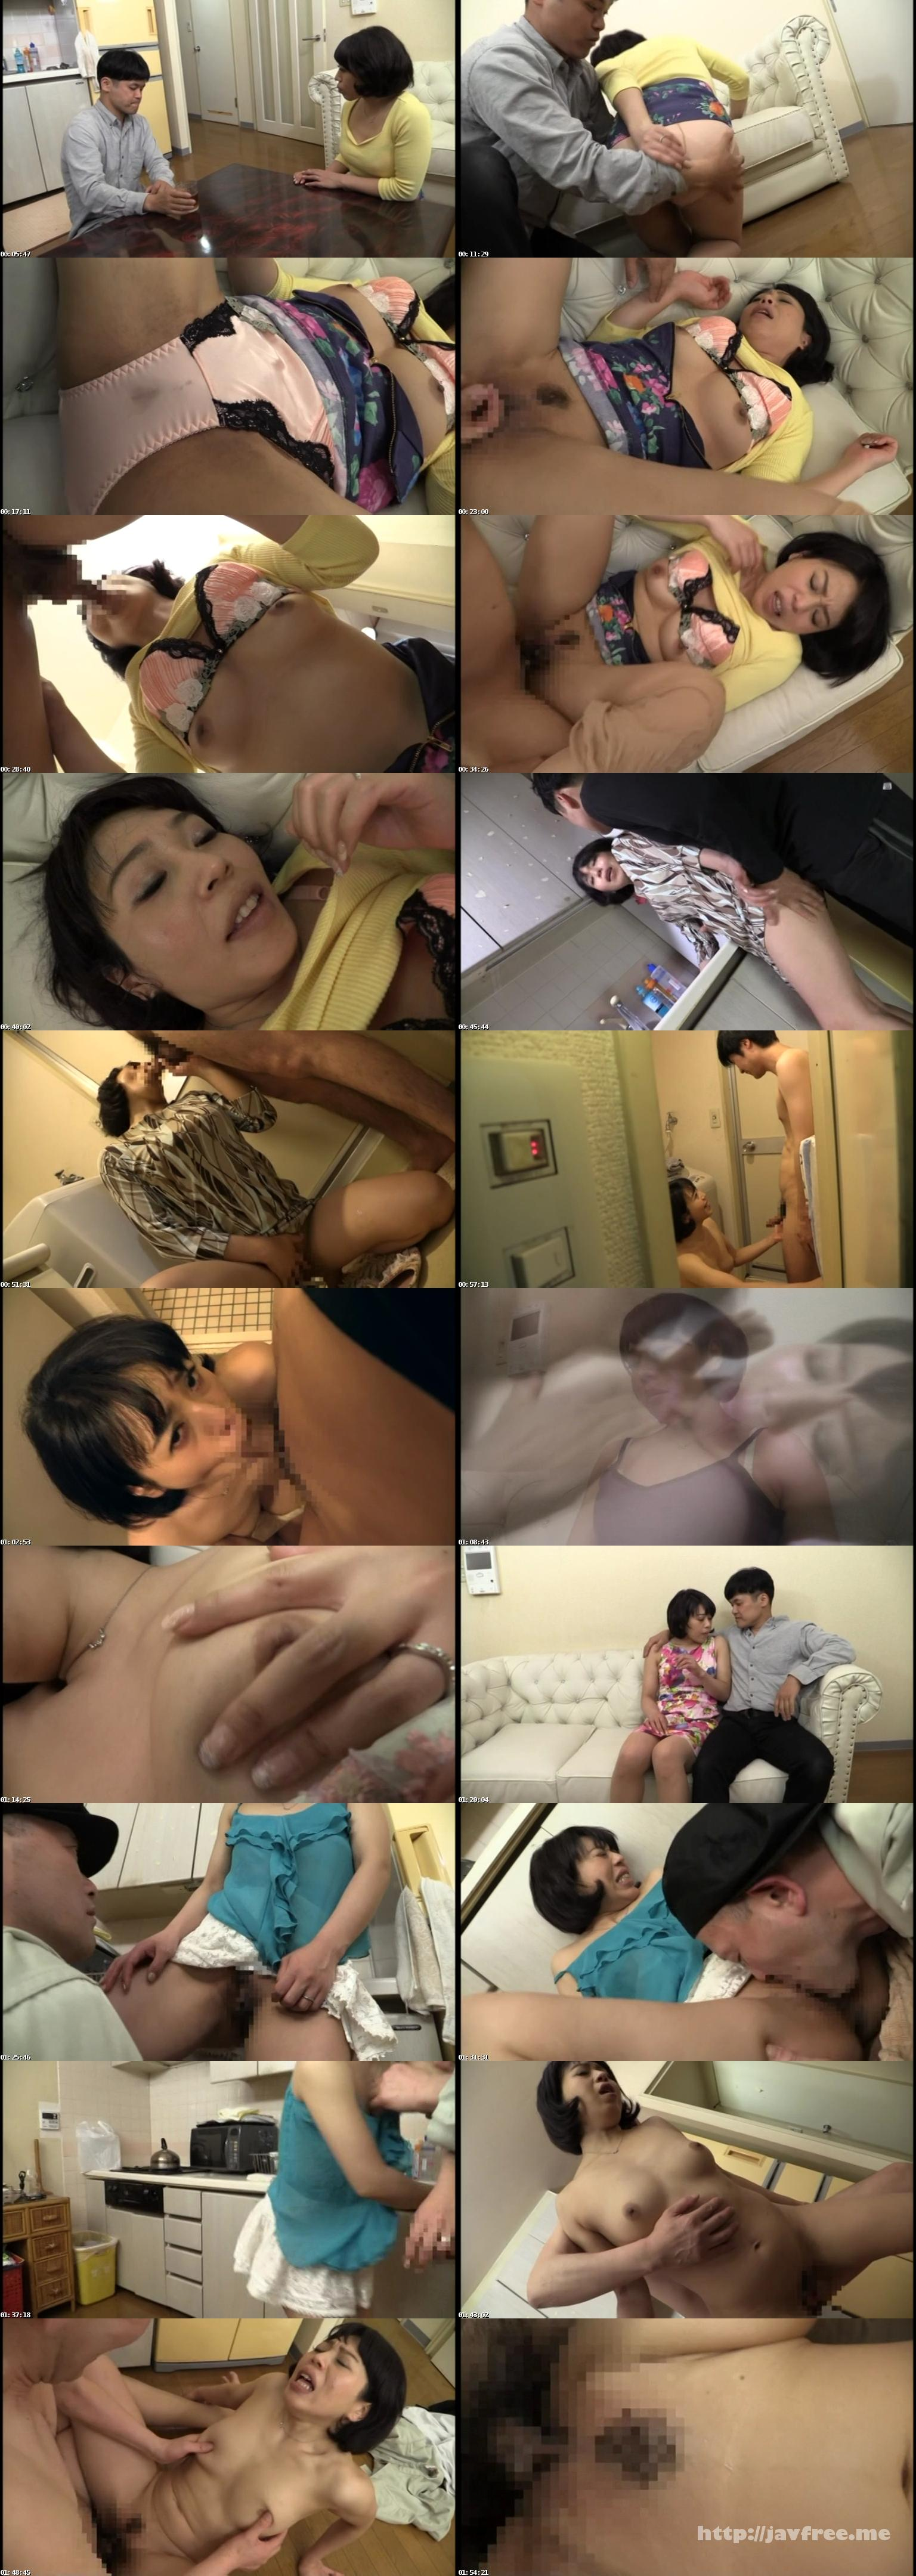 [EMBX 044] 堕ちていく蹂躙妻 「私、夫の兄に性処理肉便女として犯され続けてます…」 希佳苗 希佳苗 EMBX